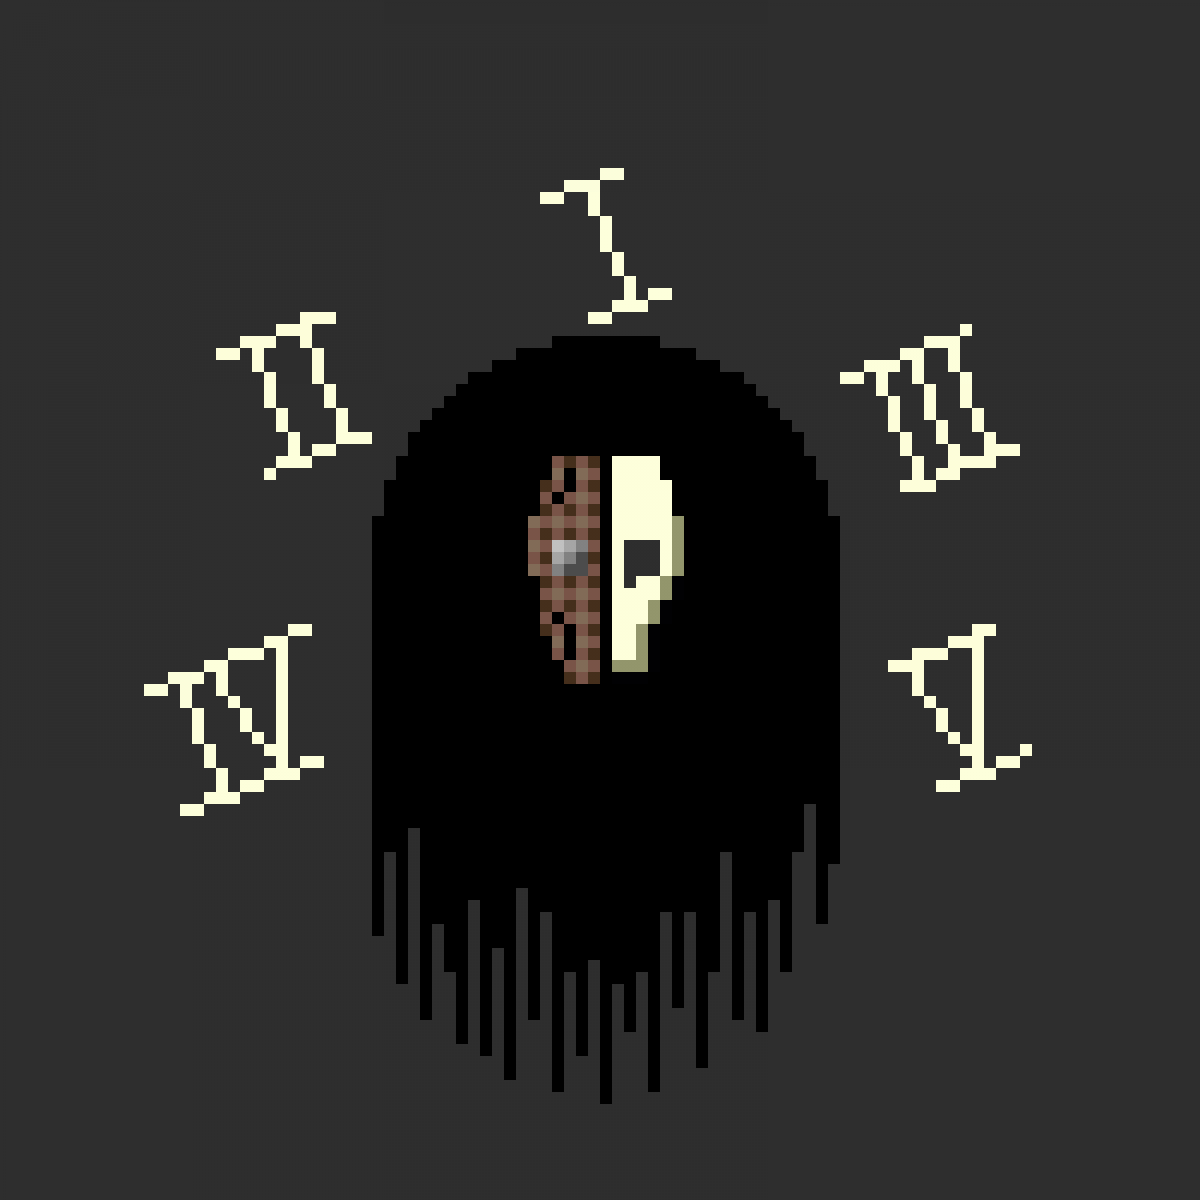 main-image-Sector 1 Emblem  by SirNirdalot